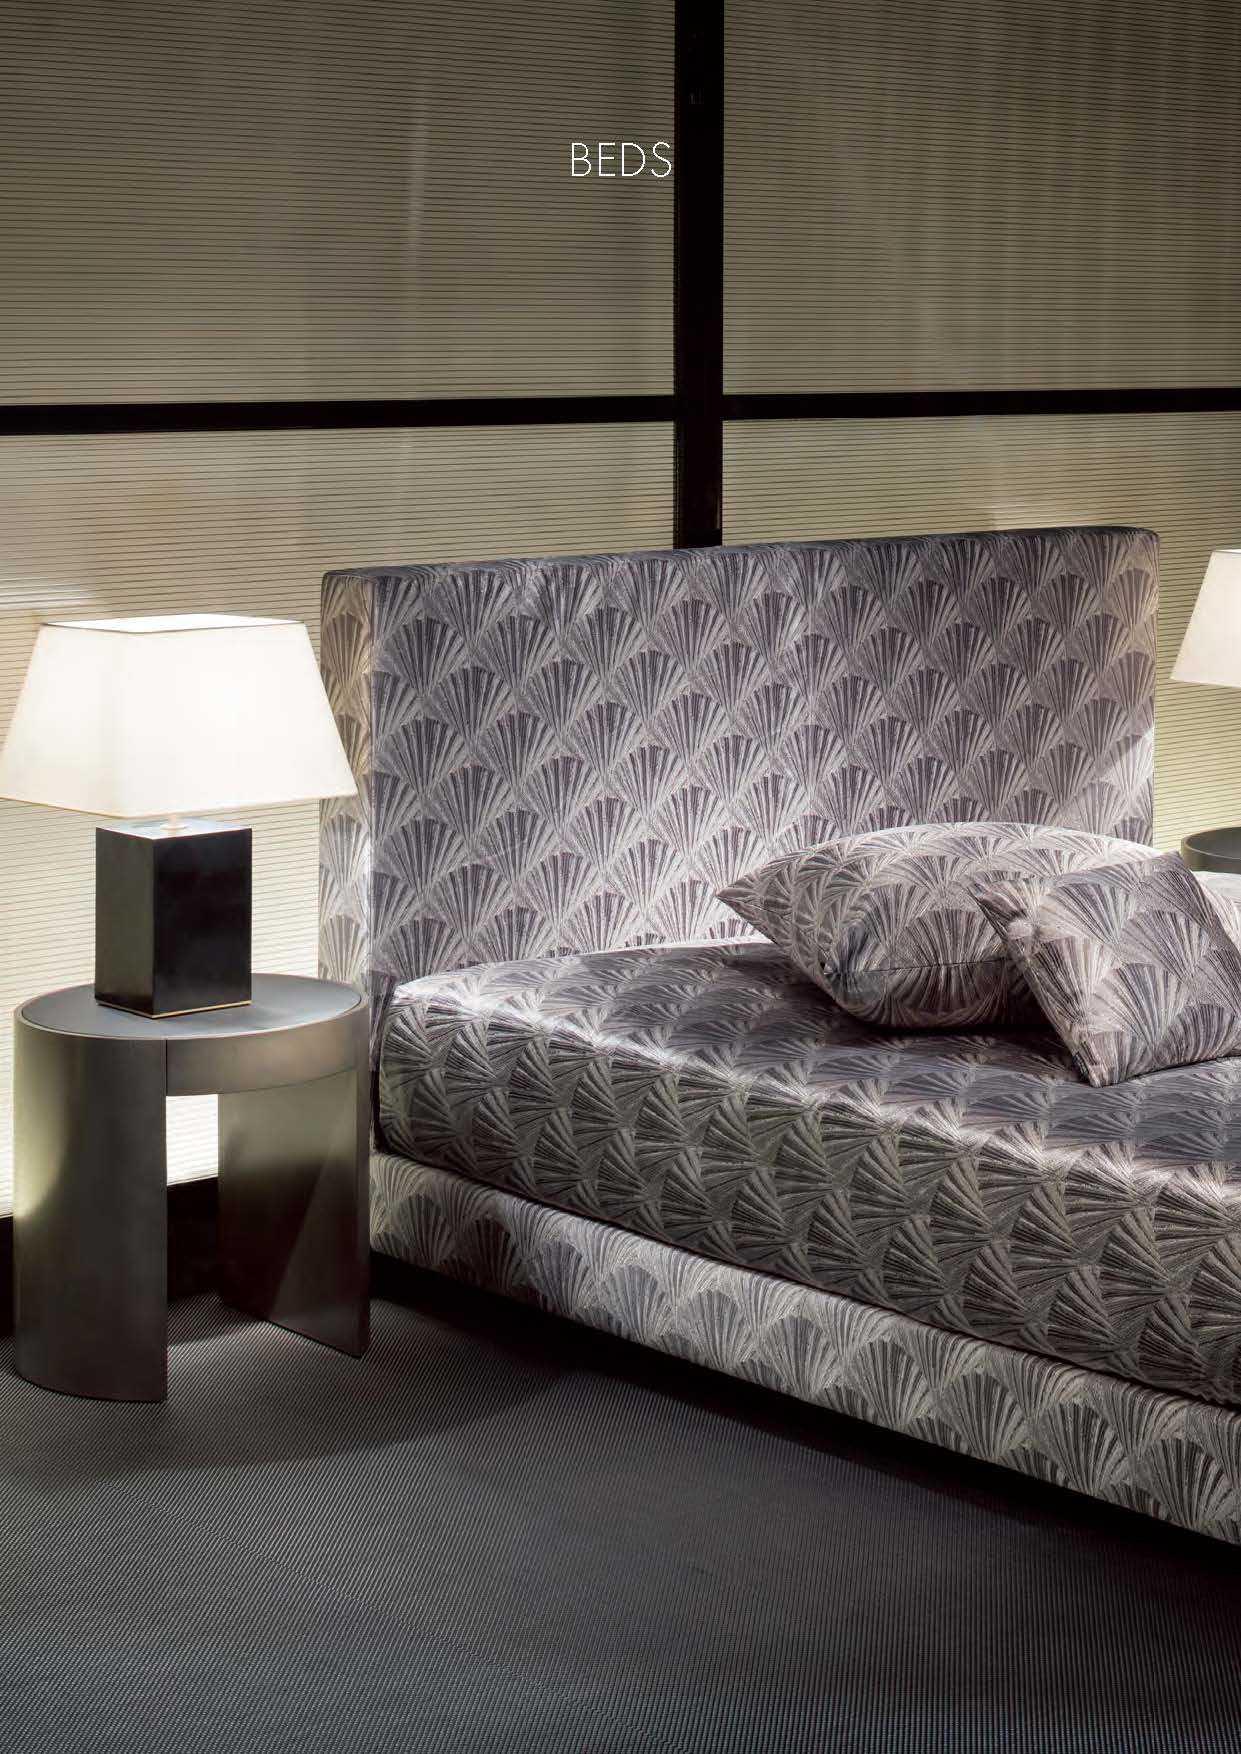 ARMANI CASA家具:兼具时尚与舒适的潮流之选